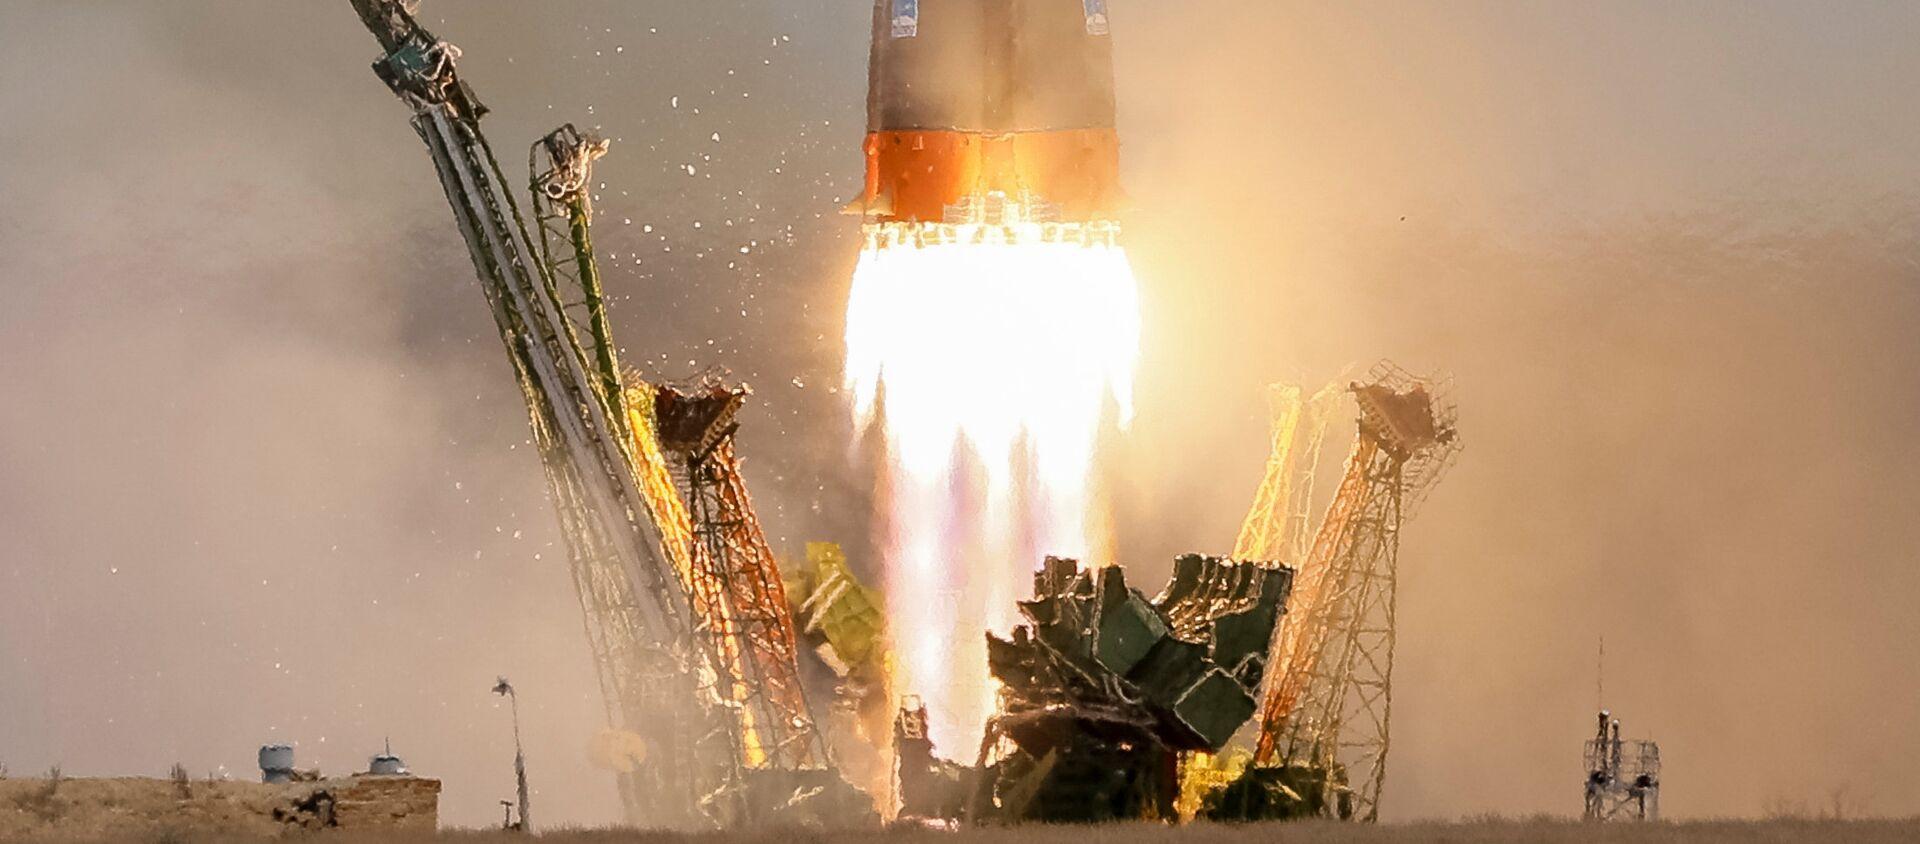 La nave rusa Soyuz MS-04 con dos tripulantes a bordo partiendo rumbo a la EEI - Sputnik Mundo, 1920, 10.02.2021